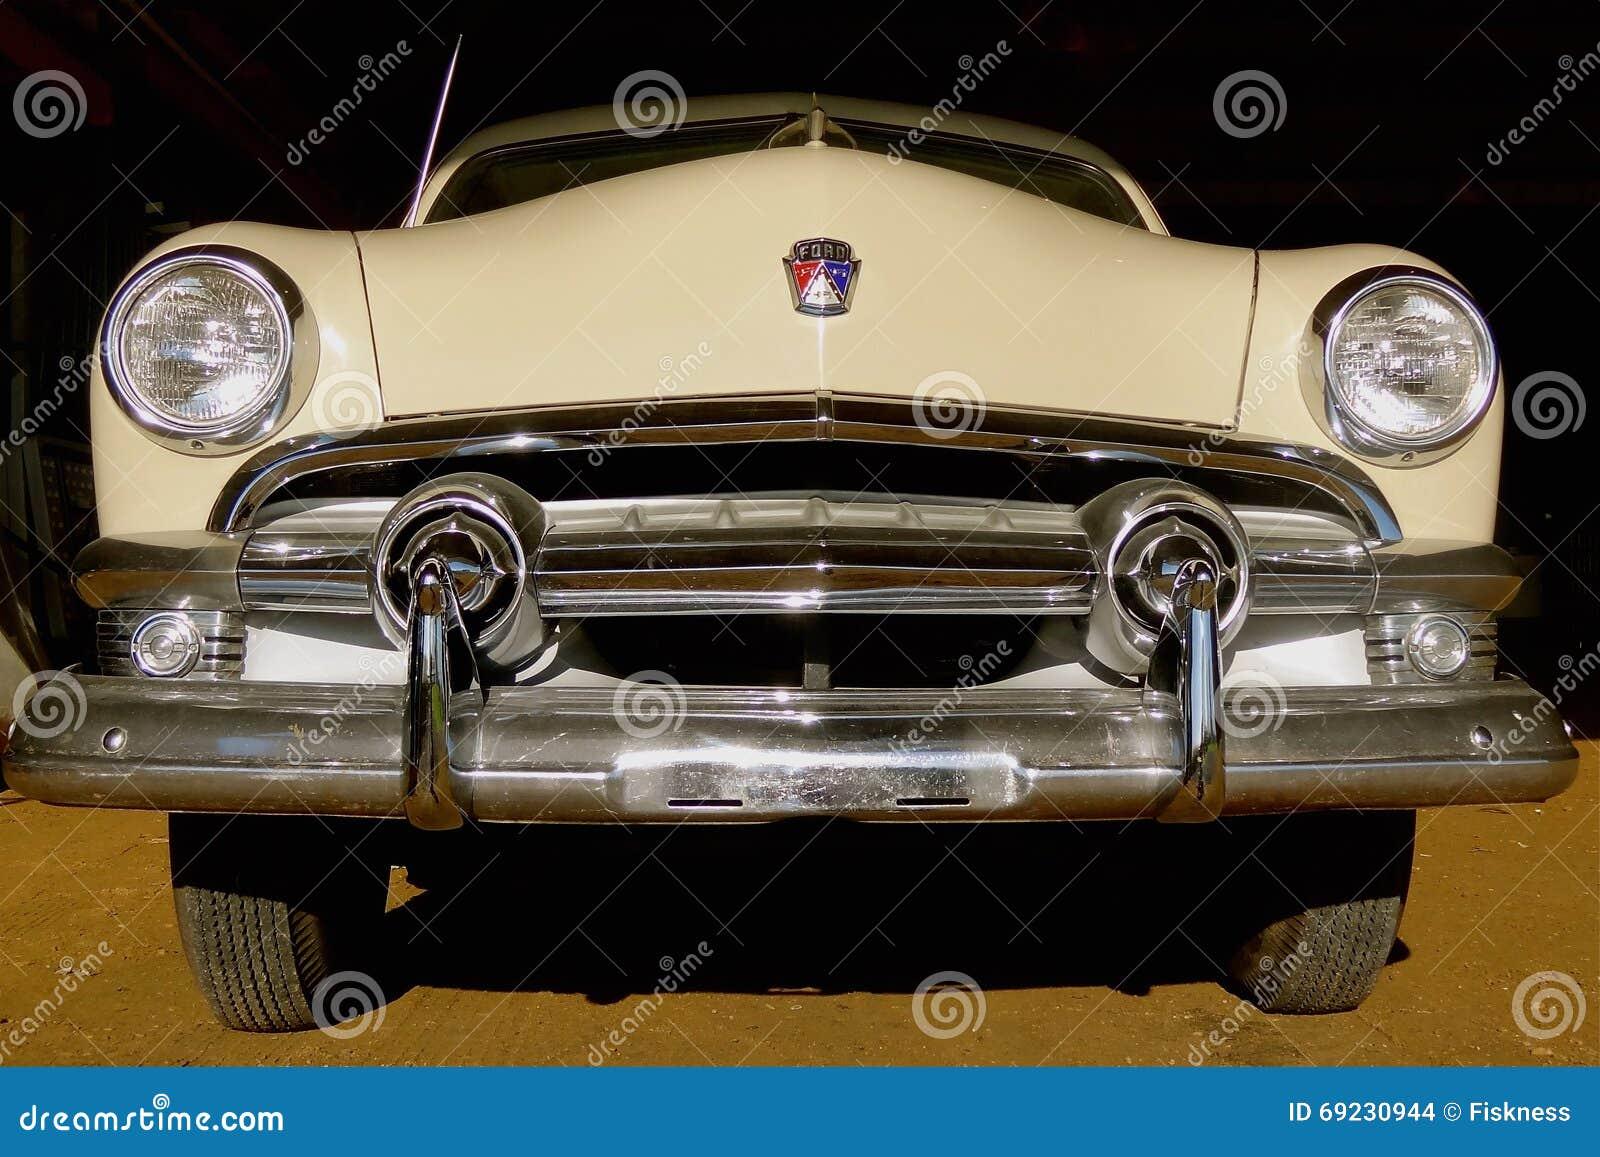 Classic 1950 Ford car